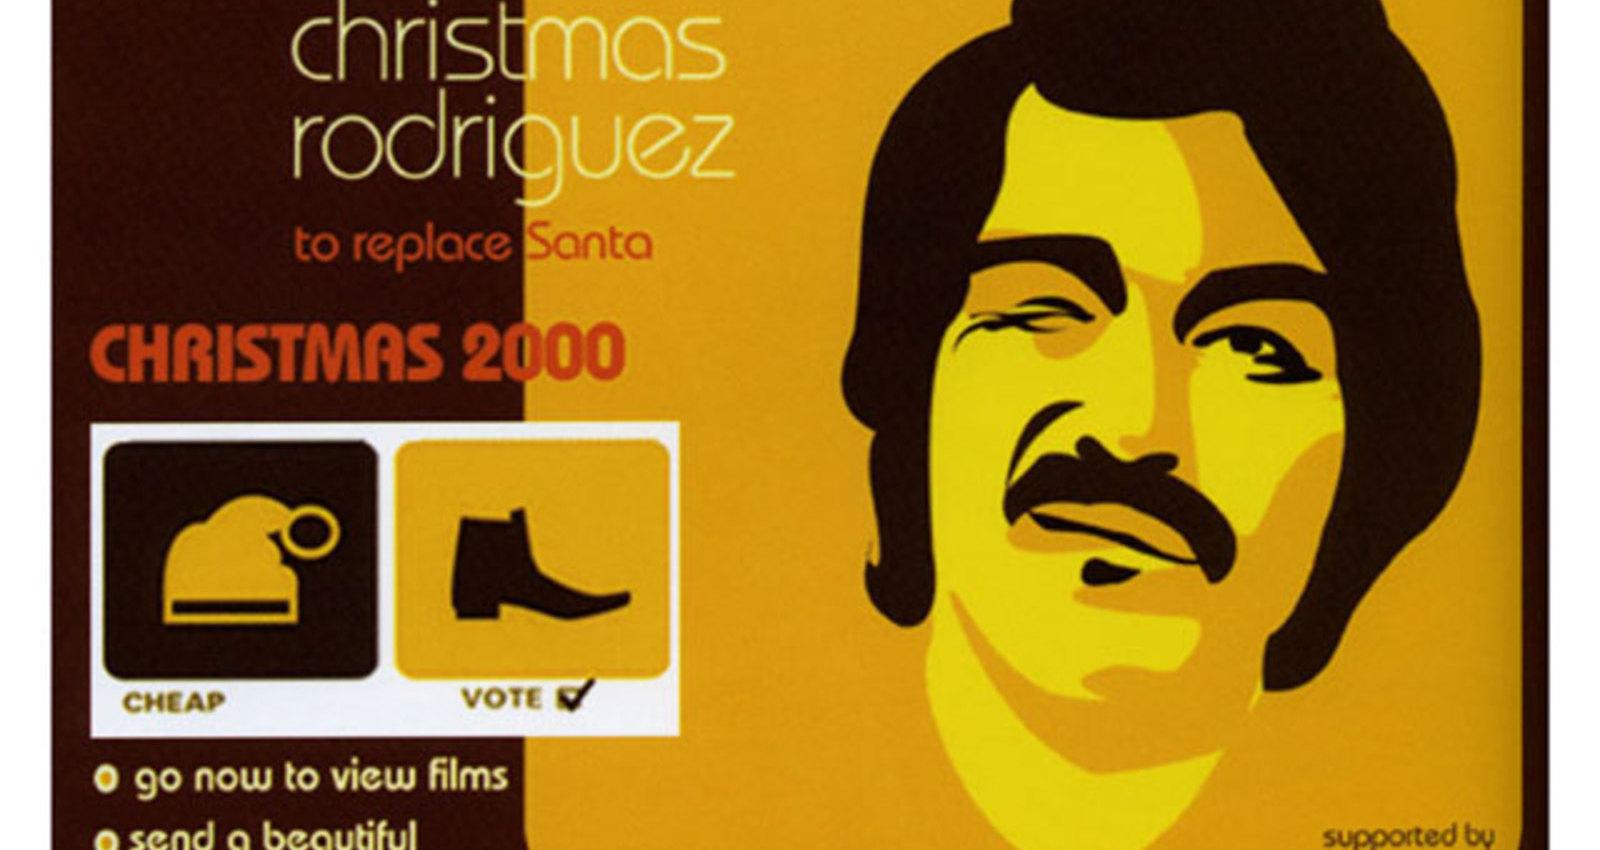 Chris Christmas Rodriguez